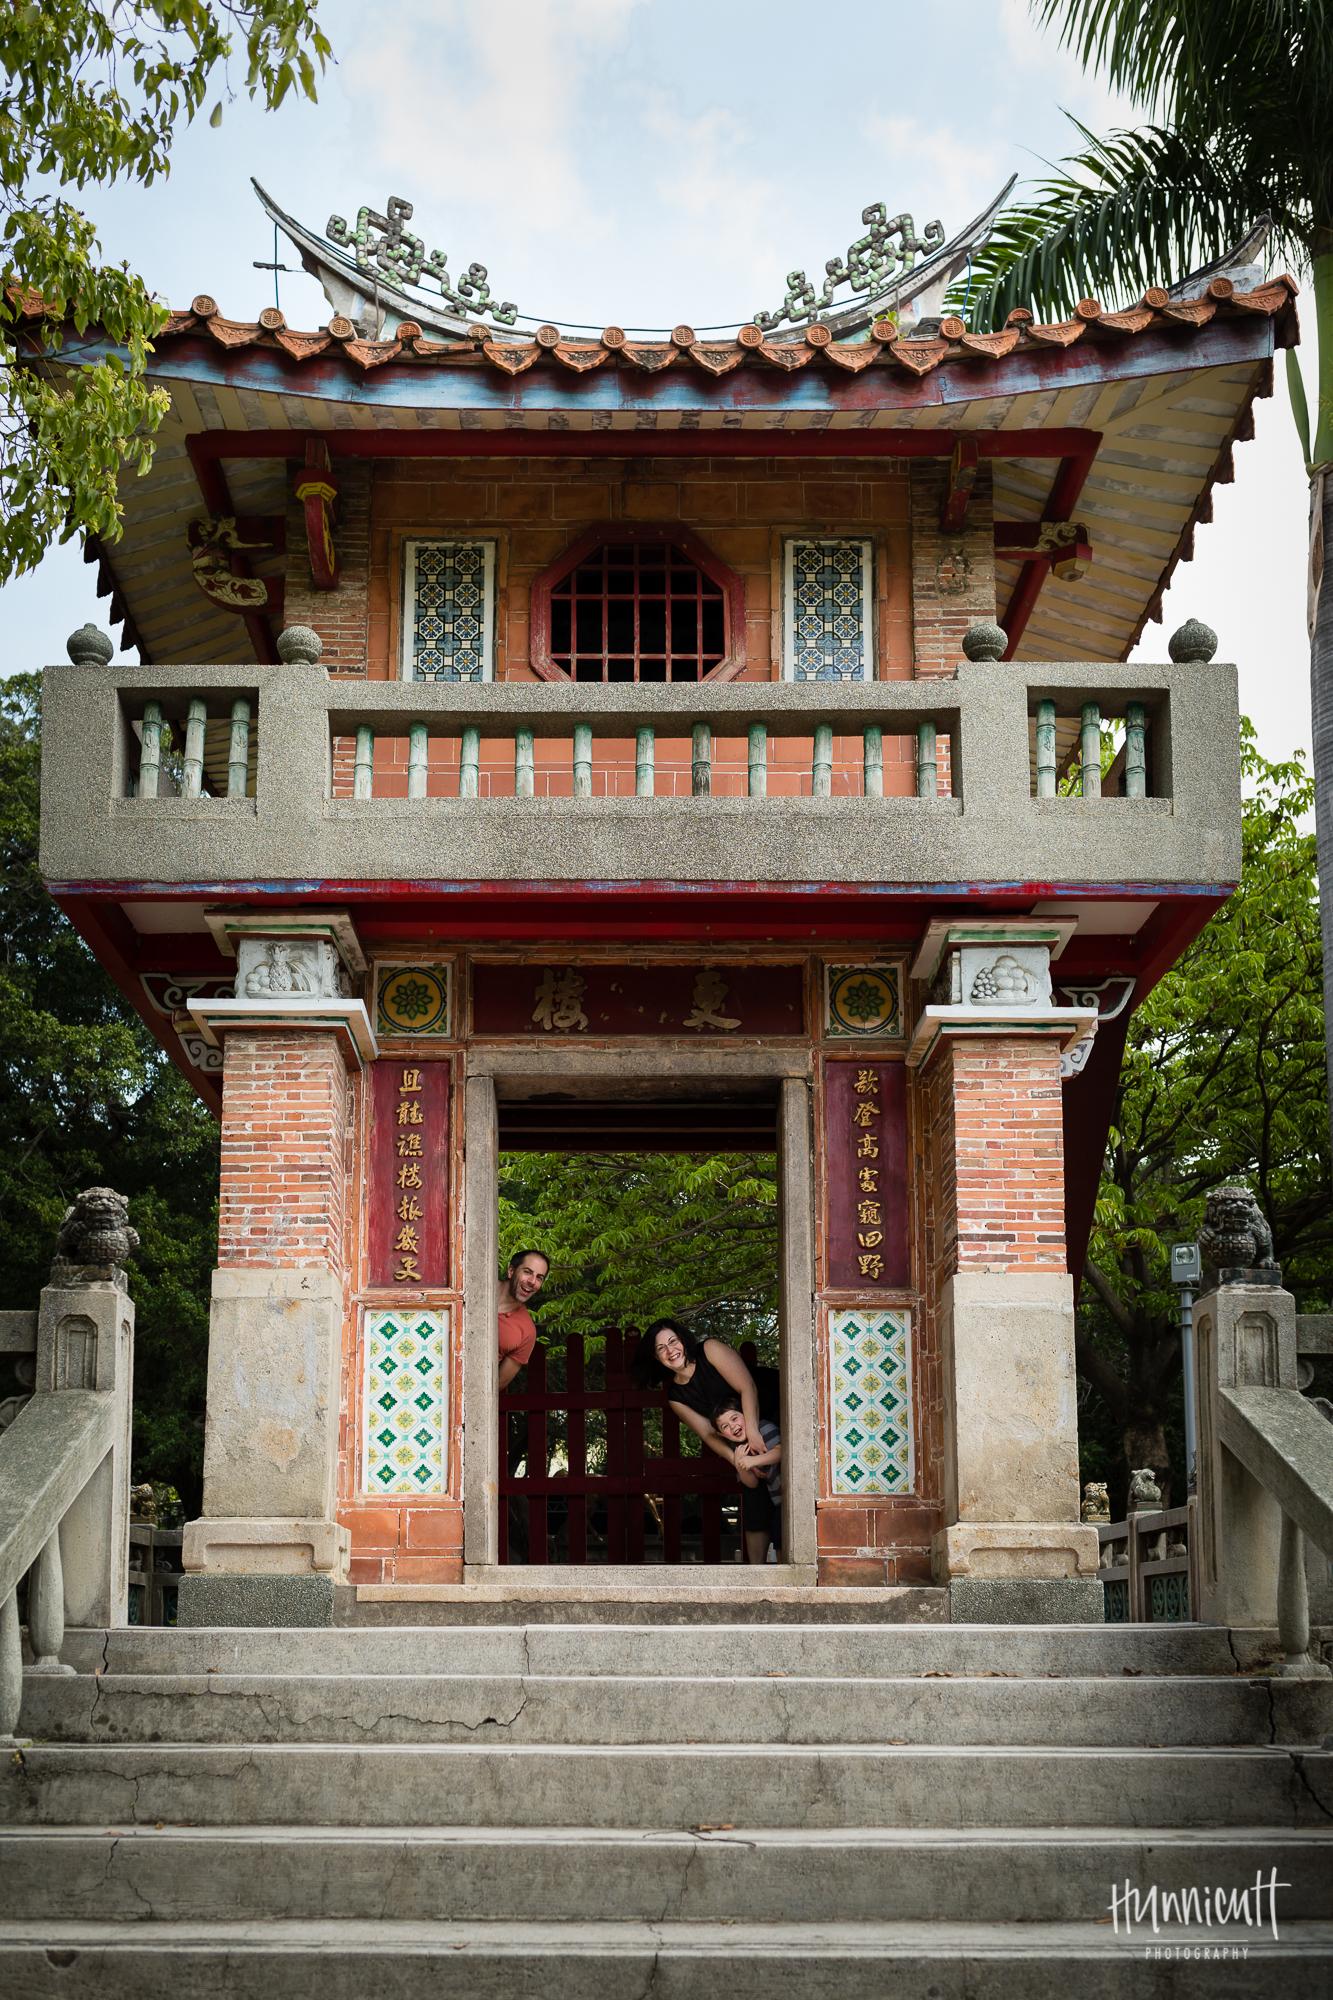 Family-Outdoor-Lifestyle-Modern-Urban-Travel-Culture-HunnicuttPhotography-RebeccaHunnicuttFarren-Taichung-Taiwan-3